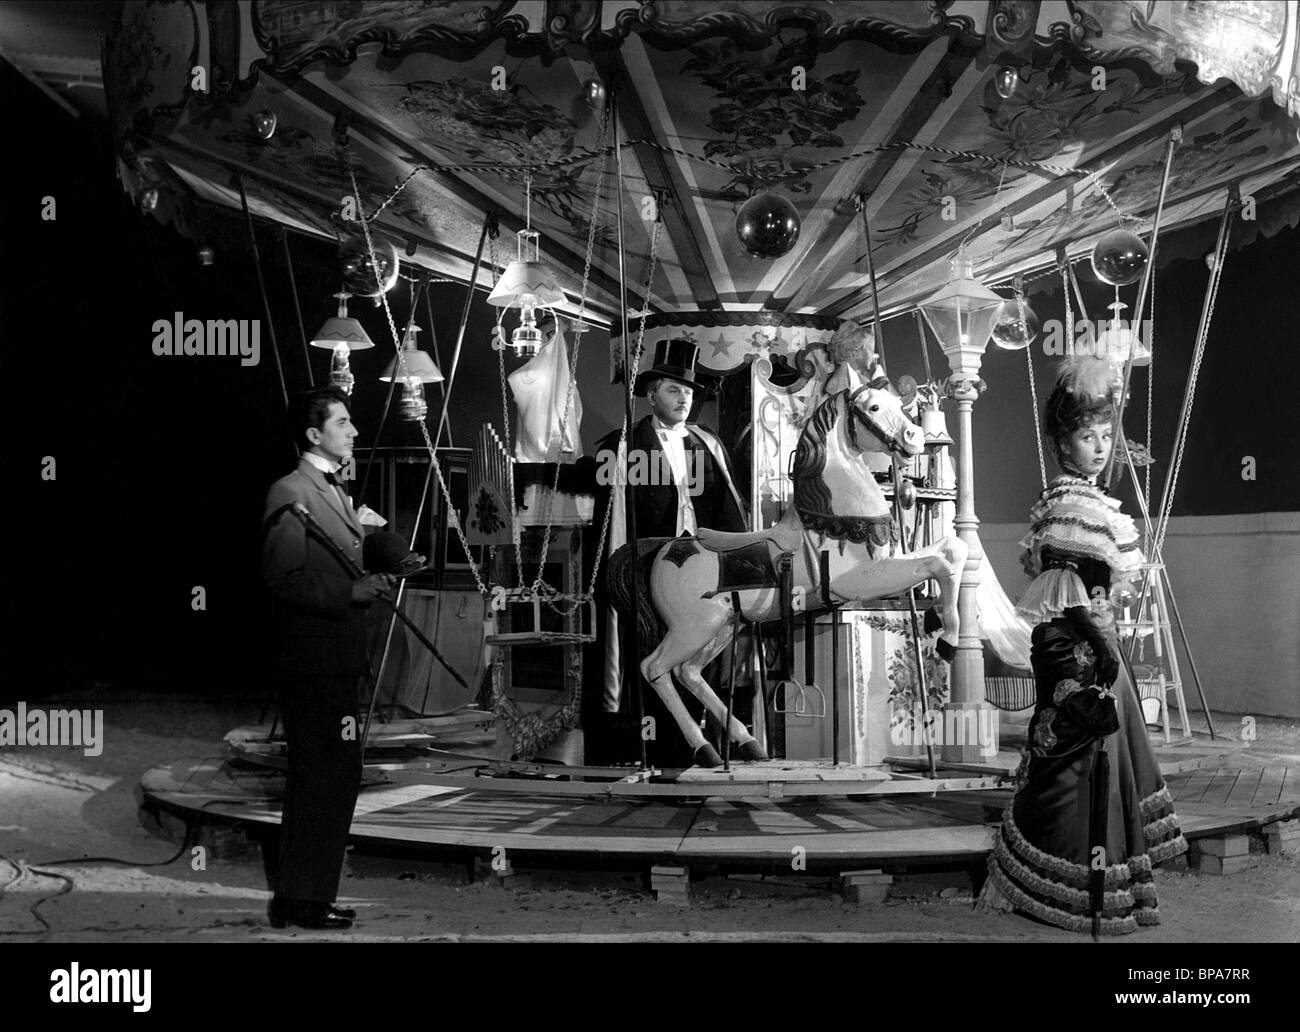 DANIEL GELIN, ANTON WALBROOK, DANIELLE DARRIEUX, LA RONDE, 1950 - Stock Image